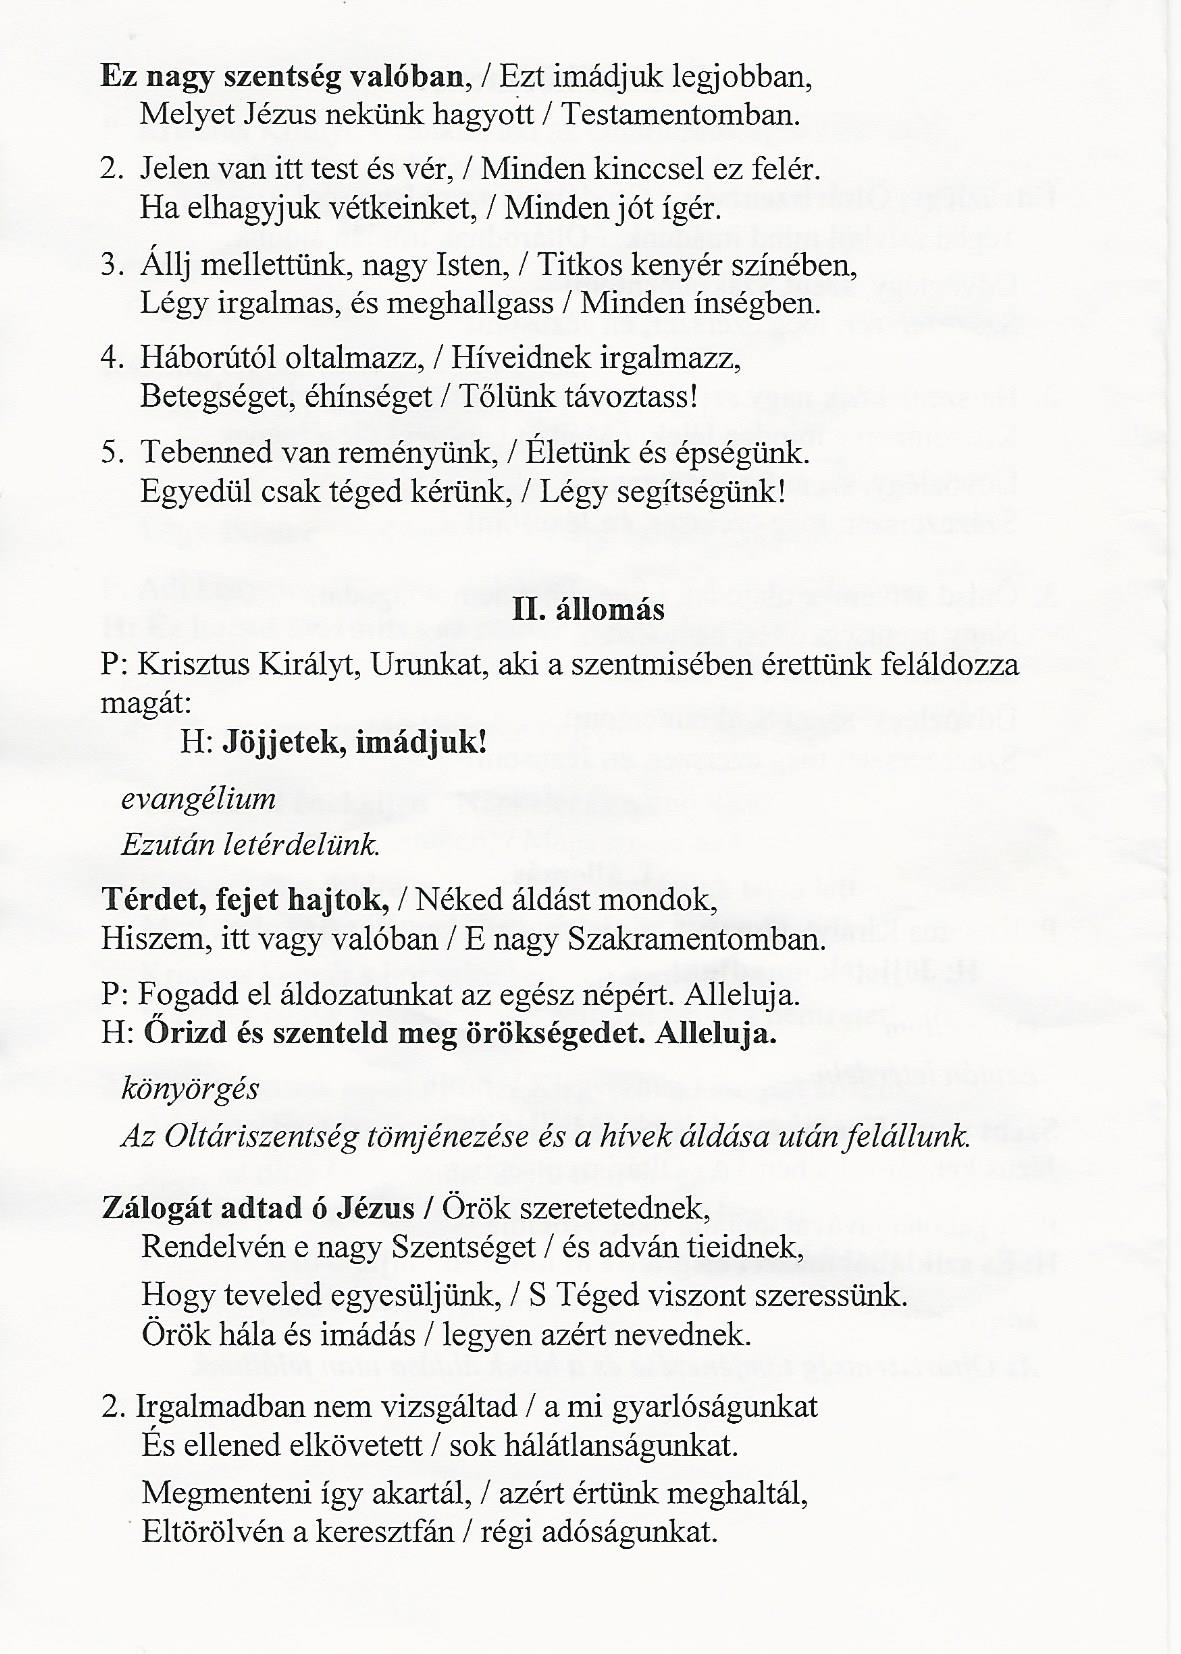 Úrnapi körmenet II.